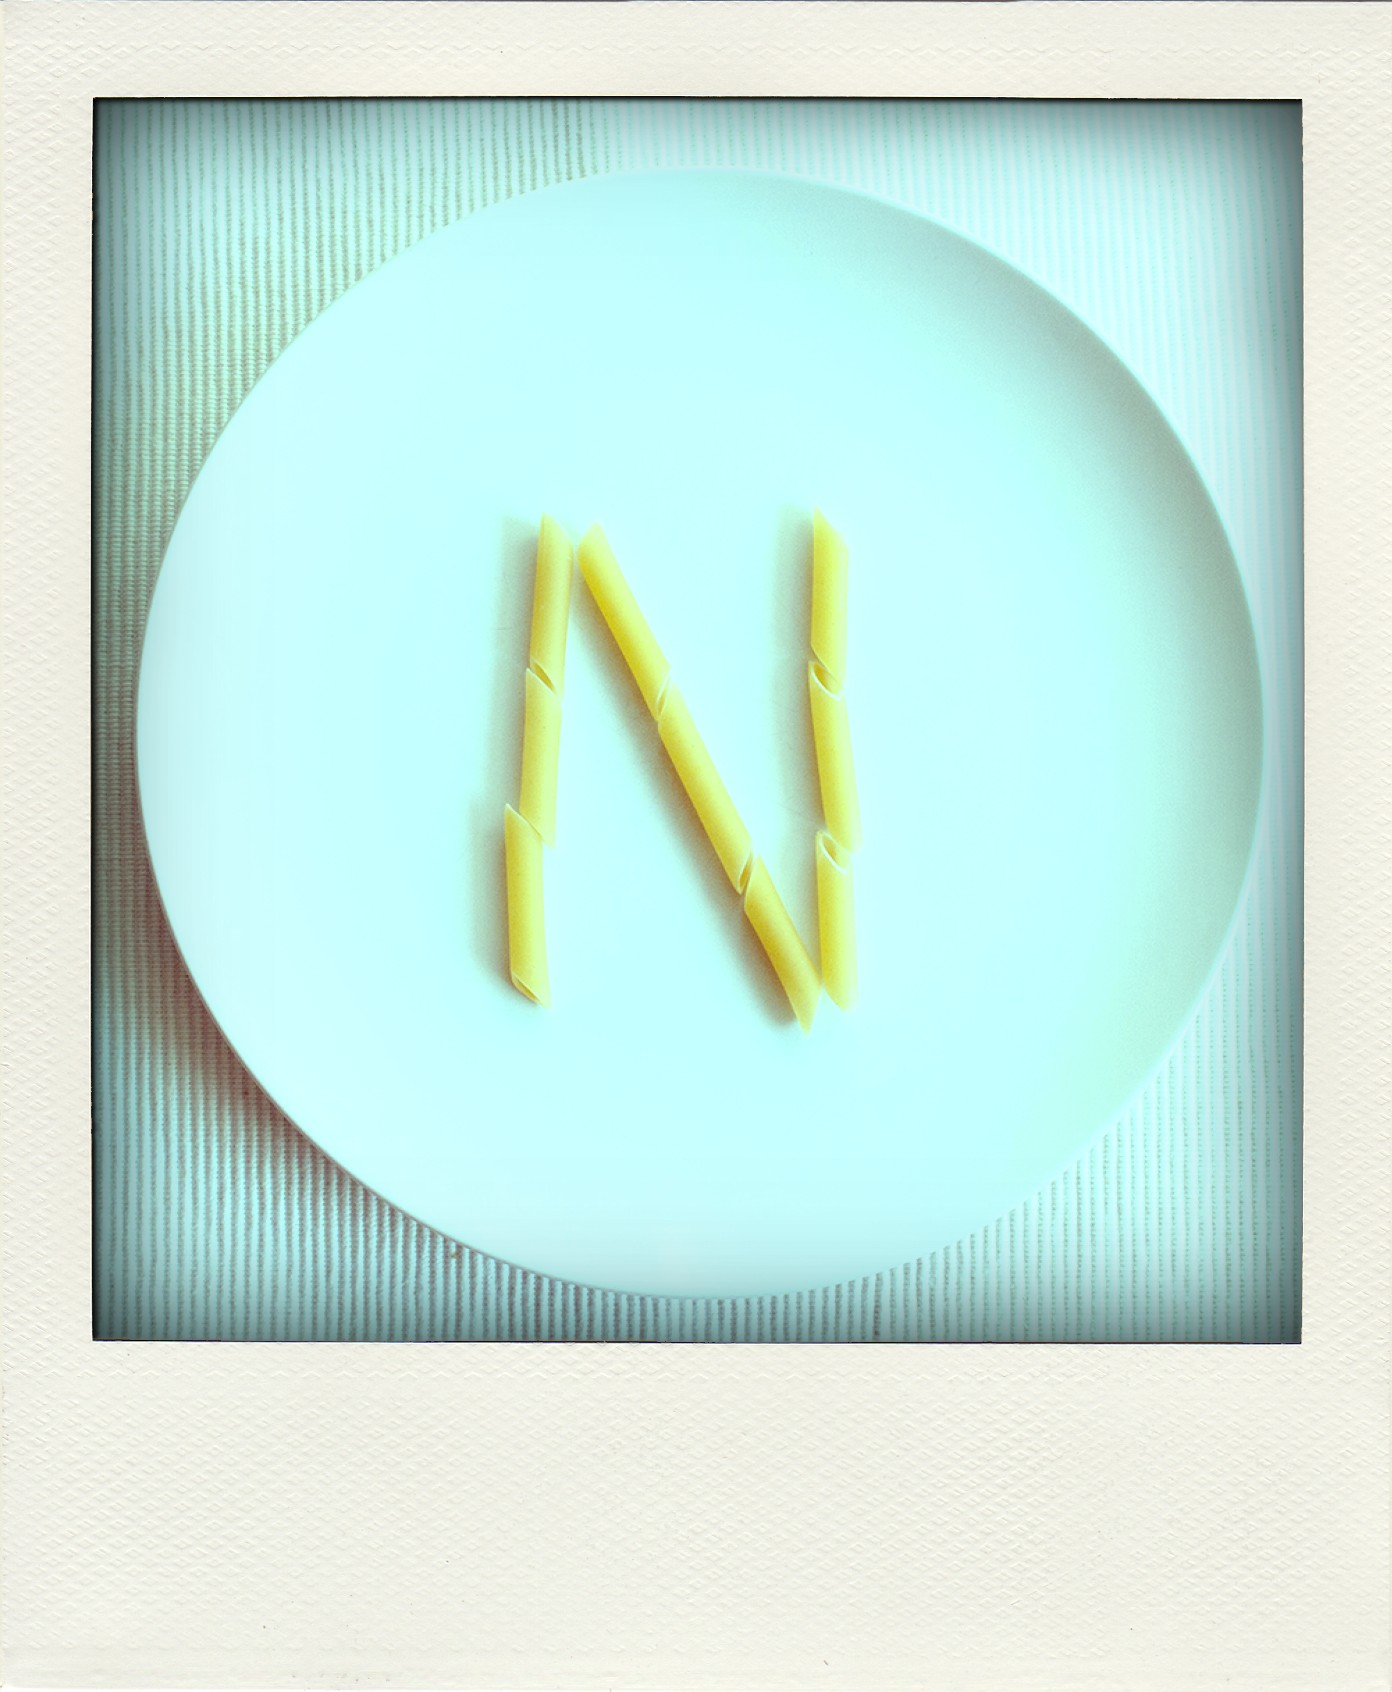 Vegan ABC - N